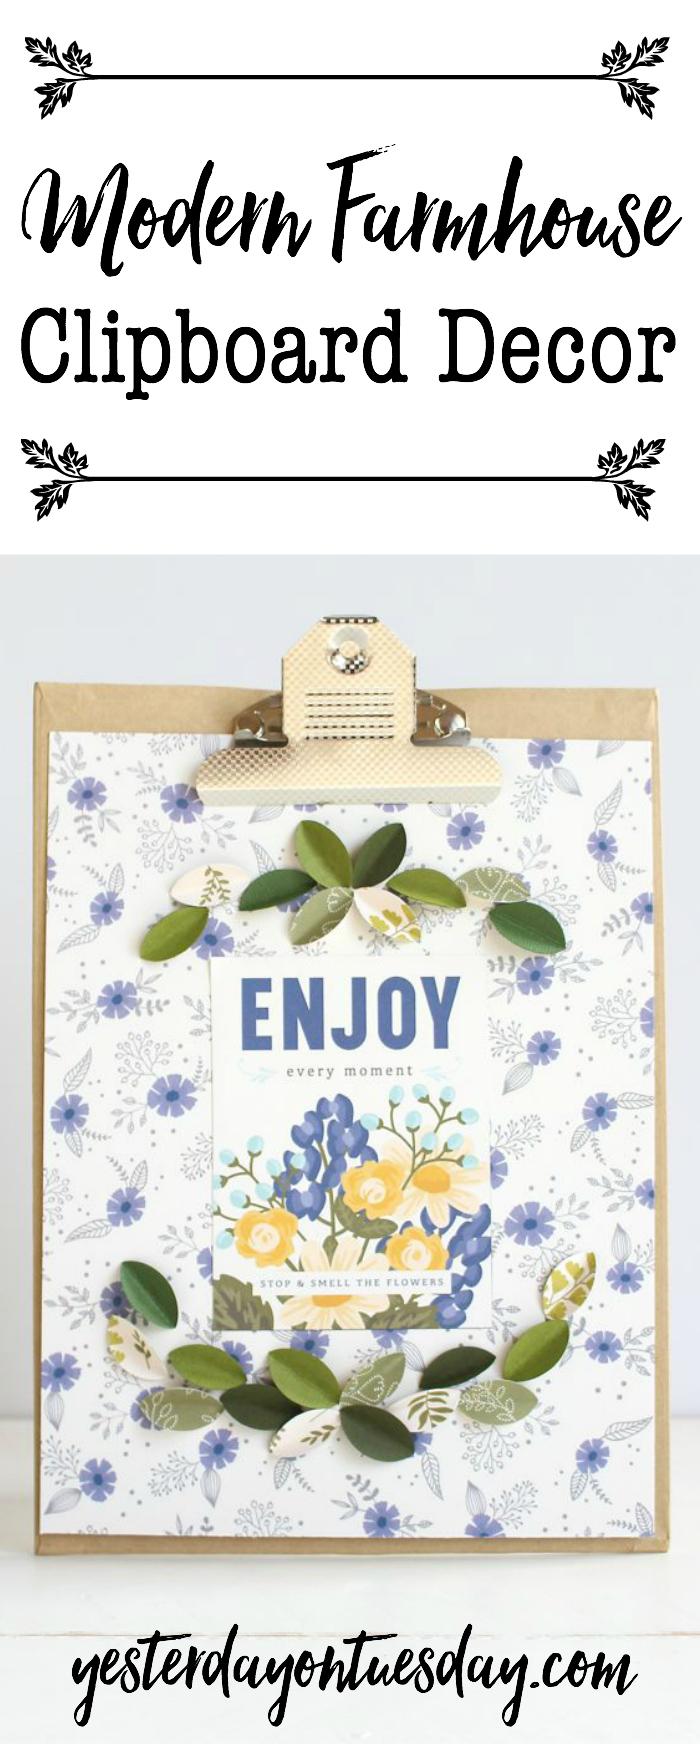 Modern Farmhouse Clipboard Decor: How to make darling fixer upper style art including mini magnolia leaves!